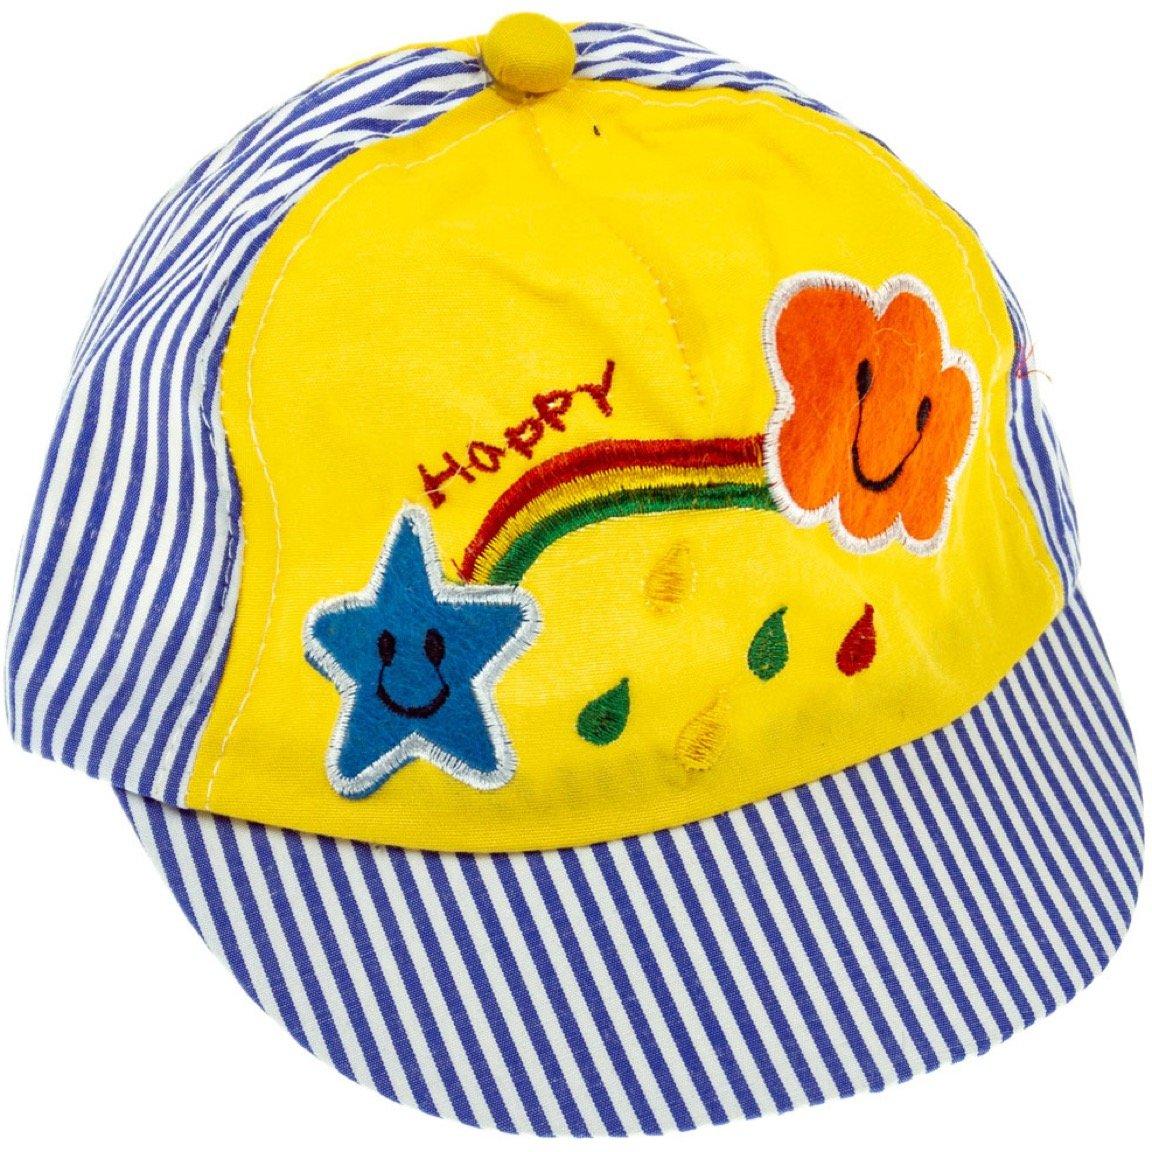 Georgia Accessories παιδικό καπέλο «Yellow Sky»